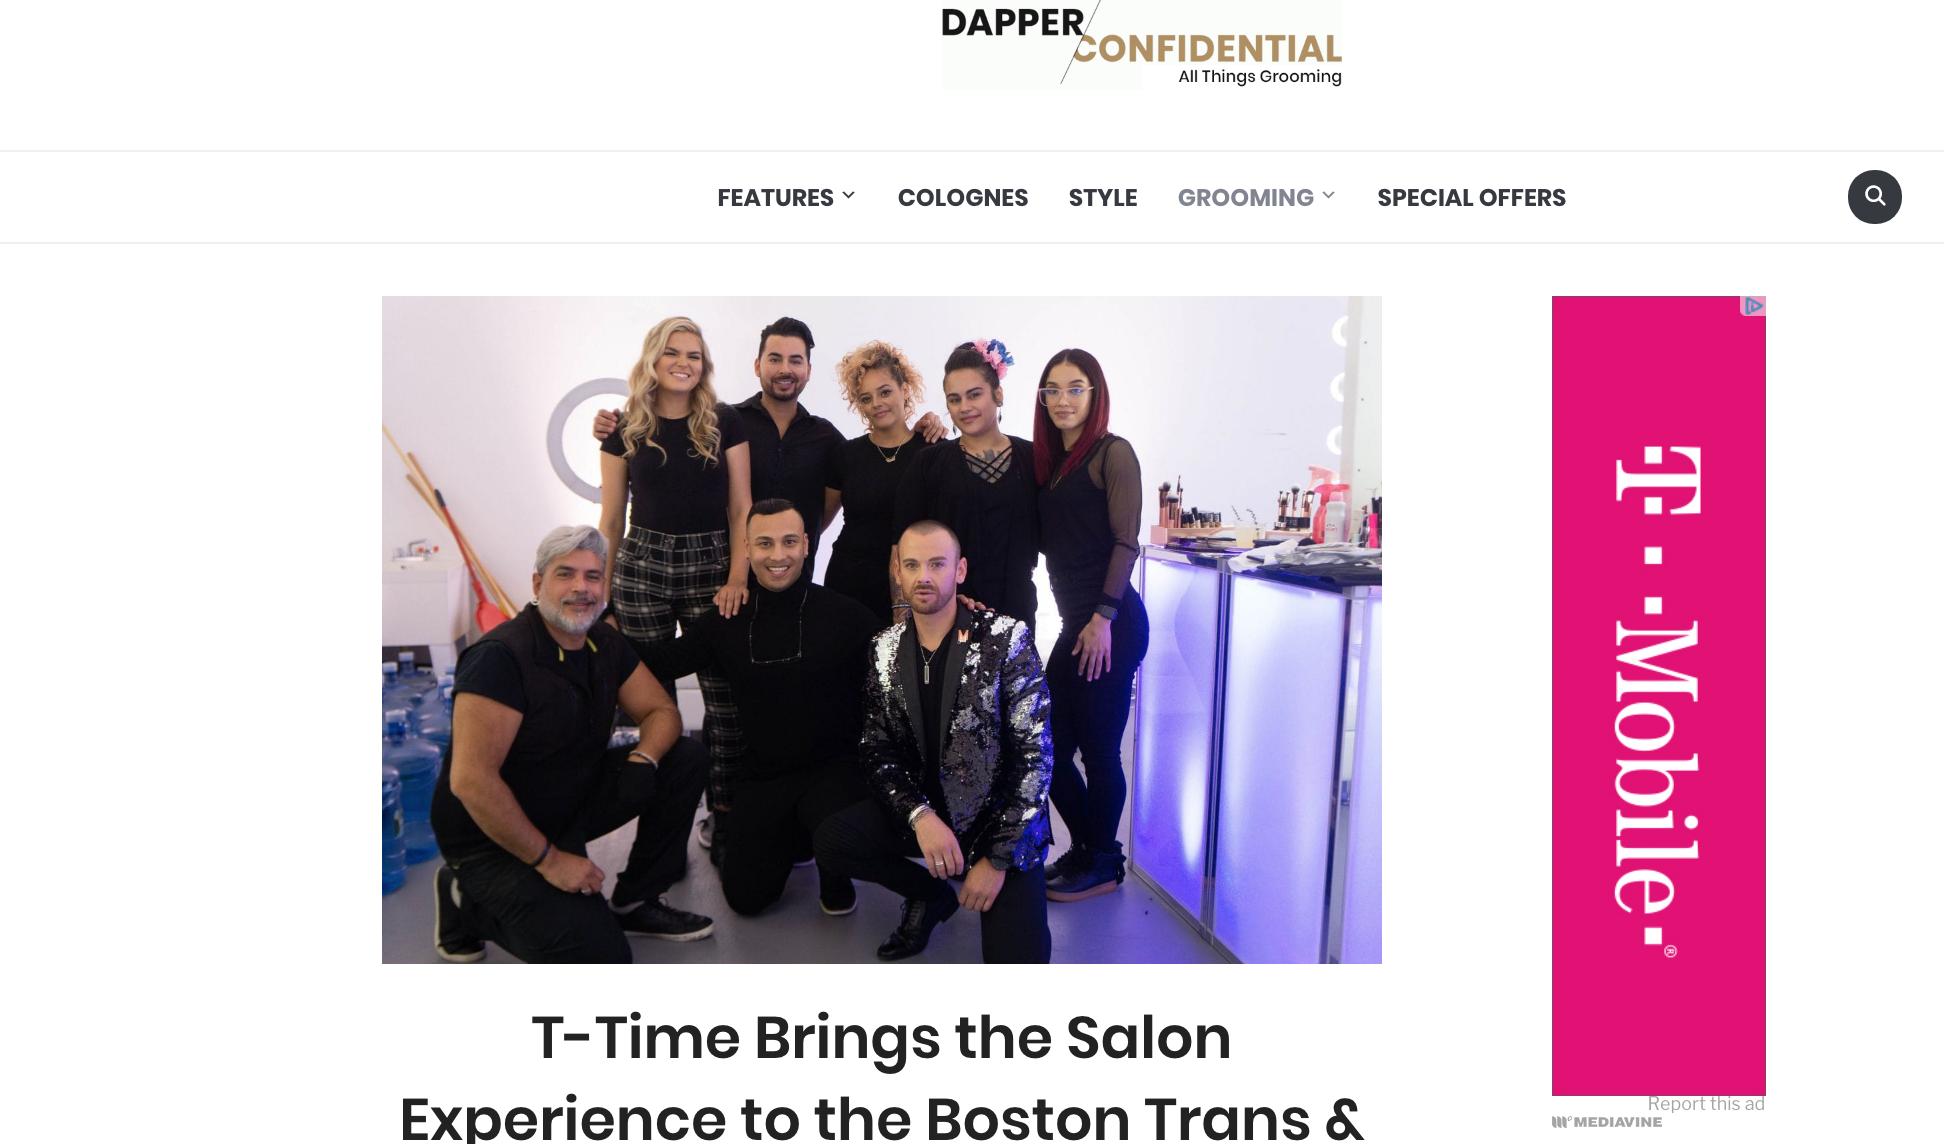 Lou Rod Cueva & Team MLR for Dapper Confidential